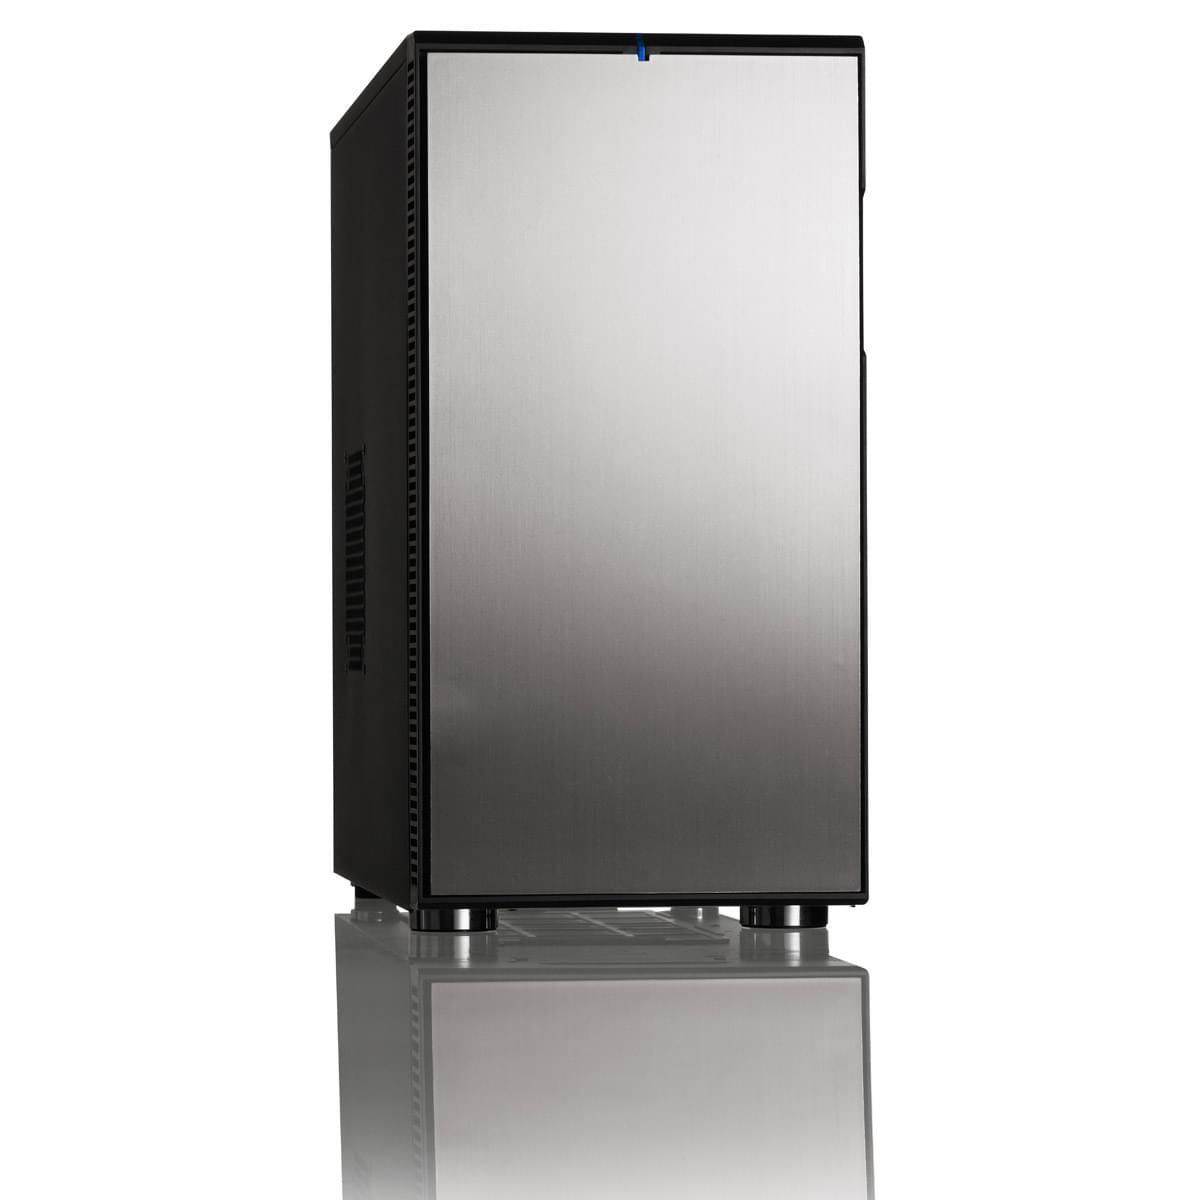 Fractal Design Define R4 Titanium Grey (FD-CA-DEF-R4-TI) - Achat / Vente Boîtier PC sur Cybertek.fr - 0